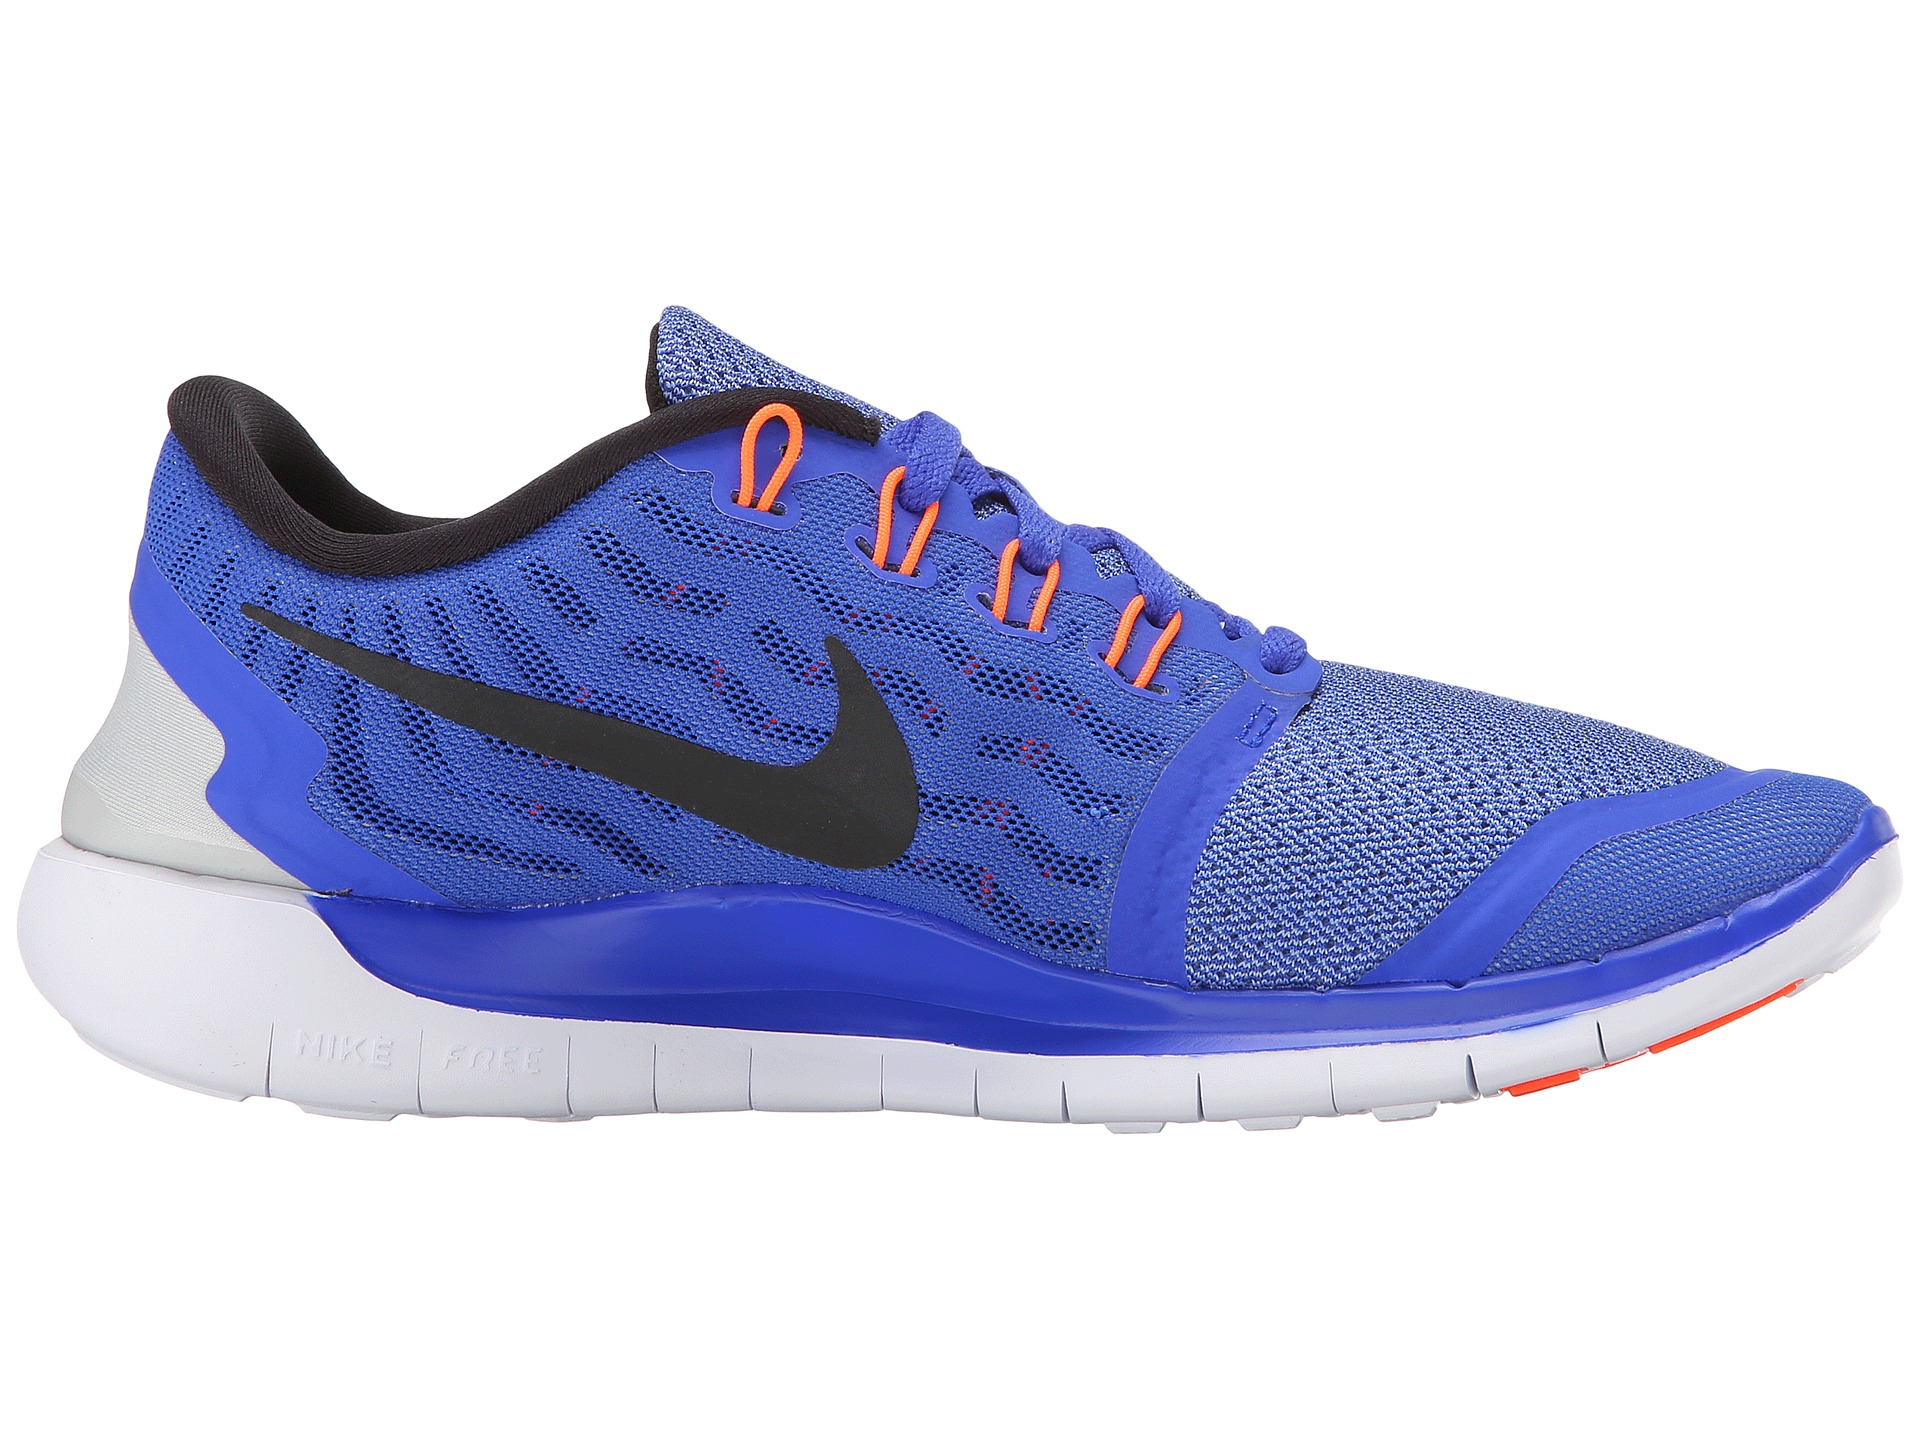 sports shoes ac63b 36bc3 nyankomne online nike blazer dame sko nyeste